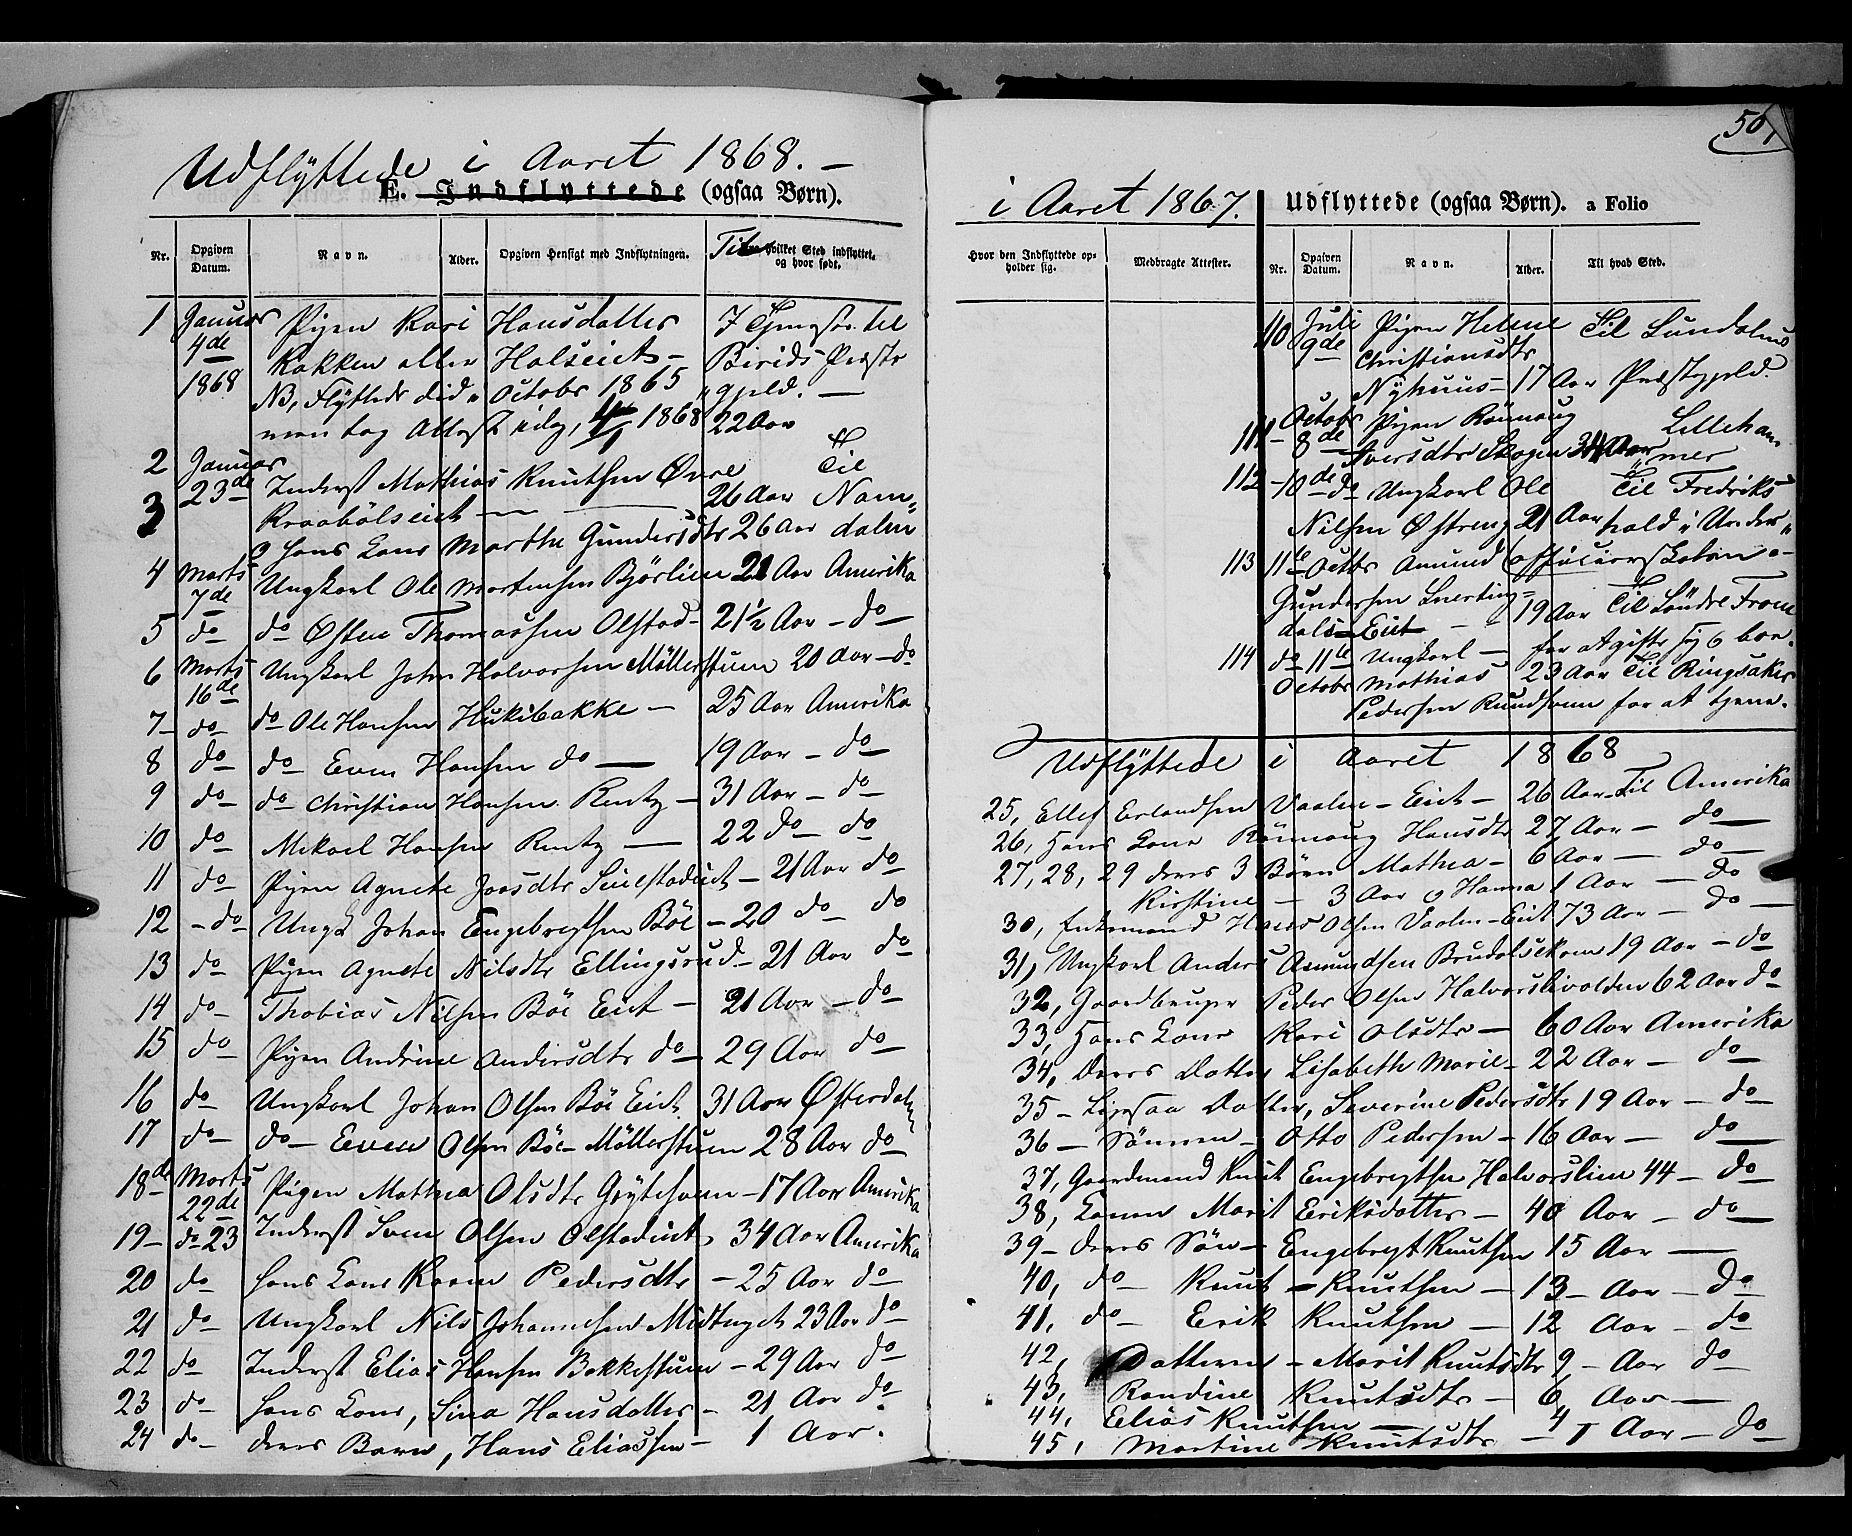 SAH, Gausdal prestekontor, Ministerialbok nr. 9, 1862-1873, s. 507